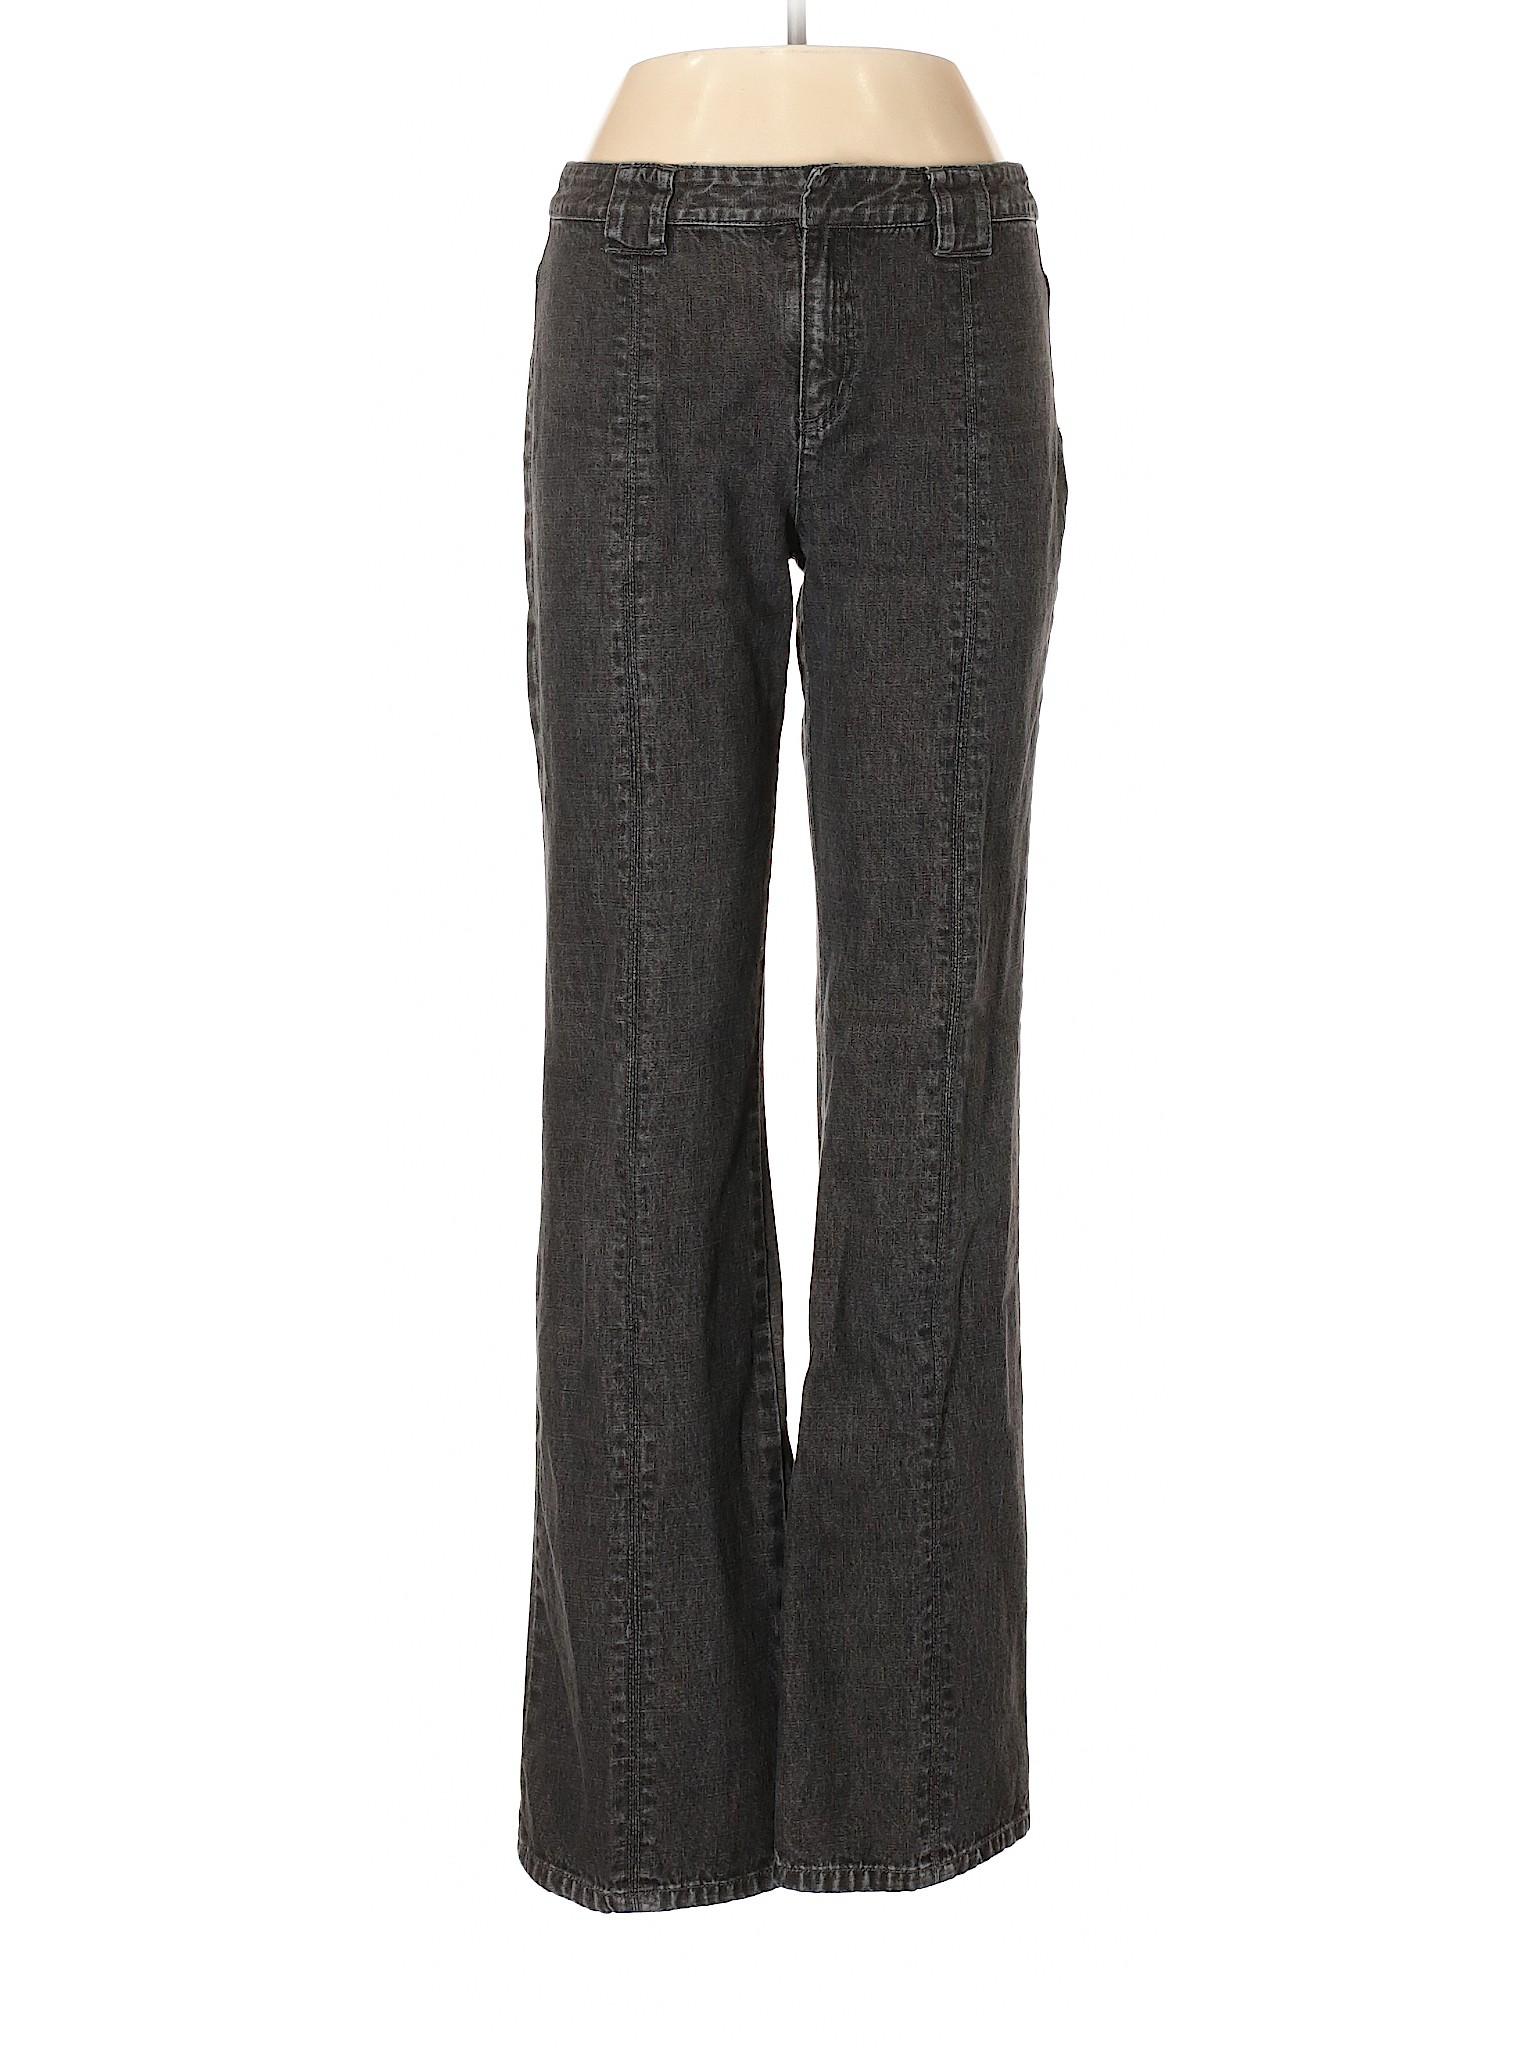 Promotion Promotion Jeans Jeans DKNY Promotion DKNY DKNY DKNY Jeans Promotion Sqnx00